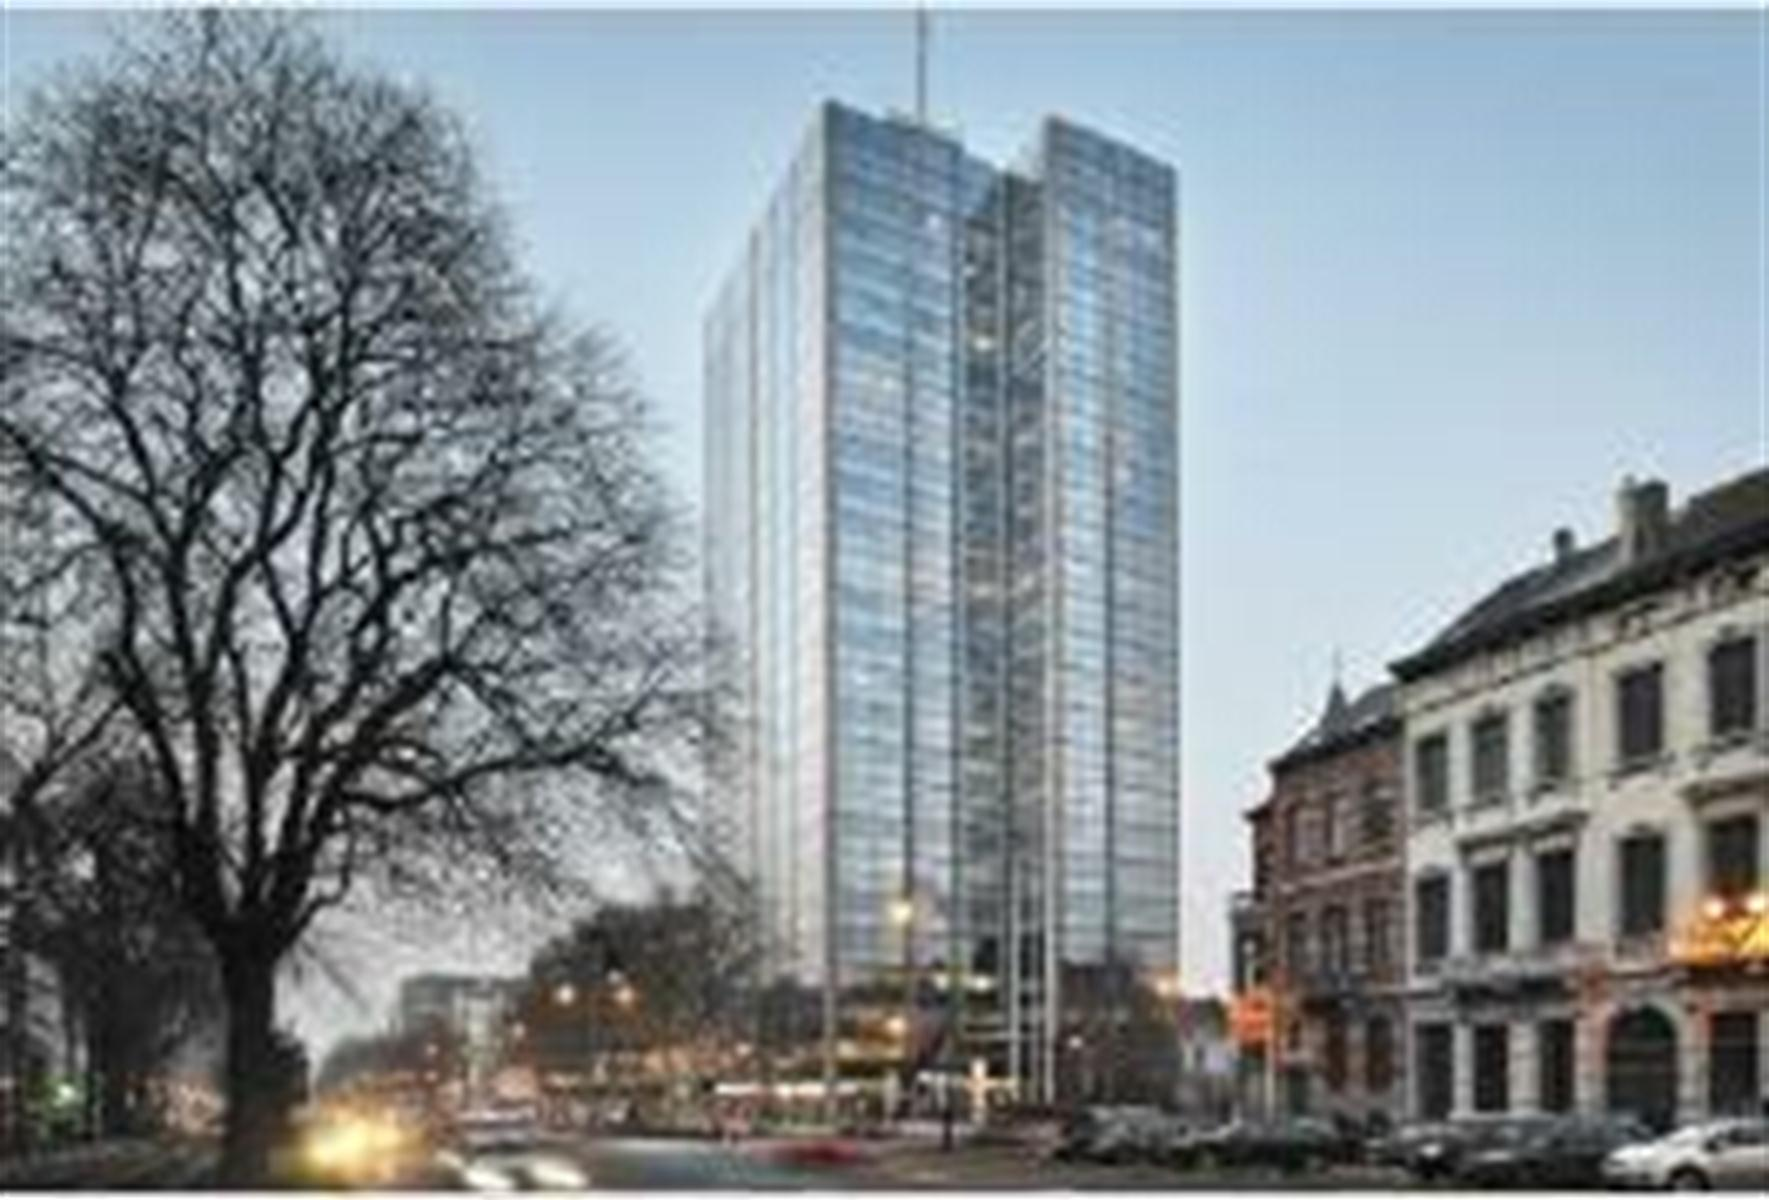 LOUISE 326 BLUE TOWER - Bruxelles - #2974746-1